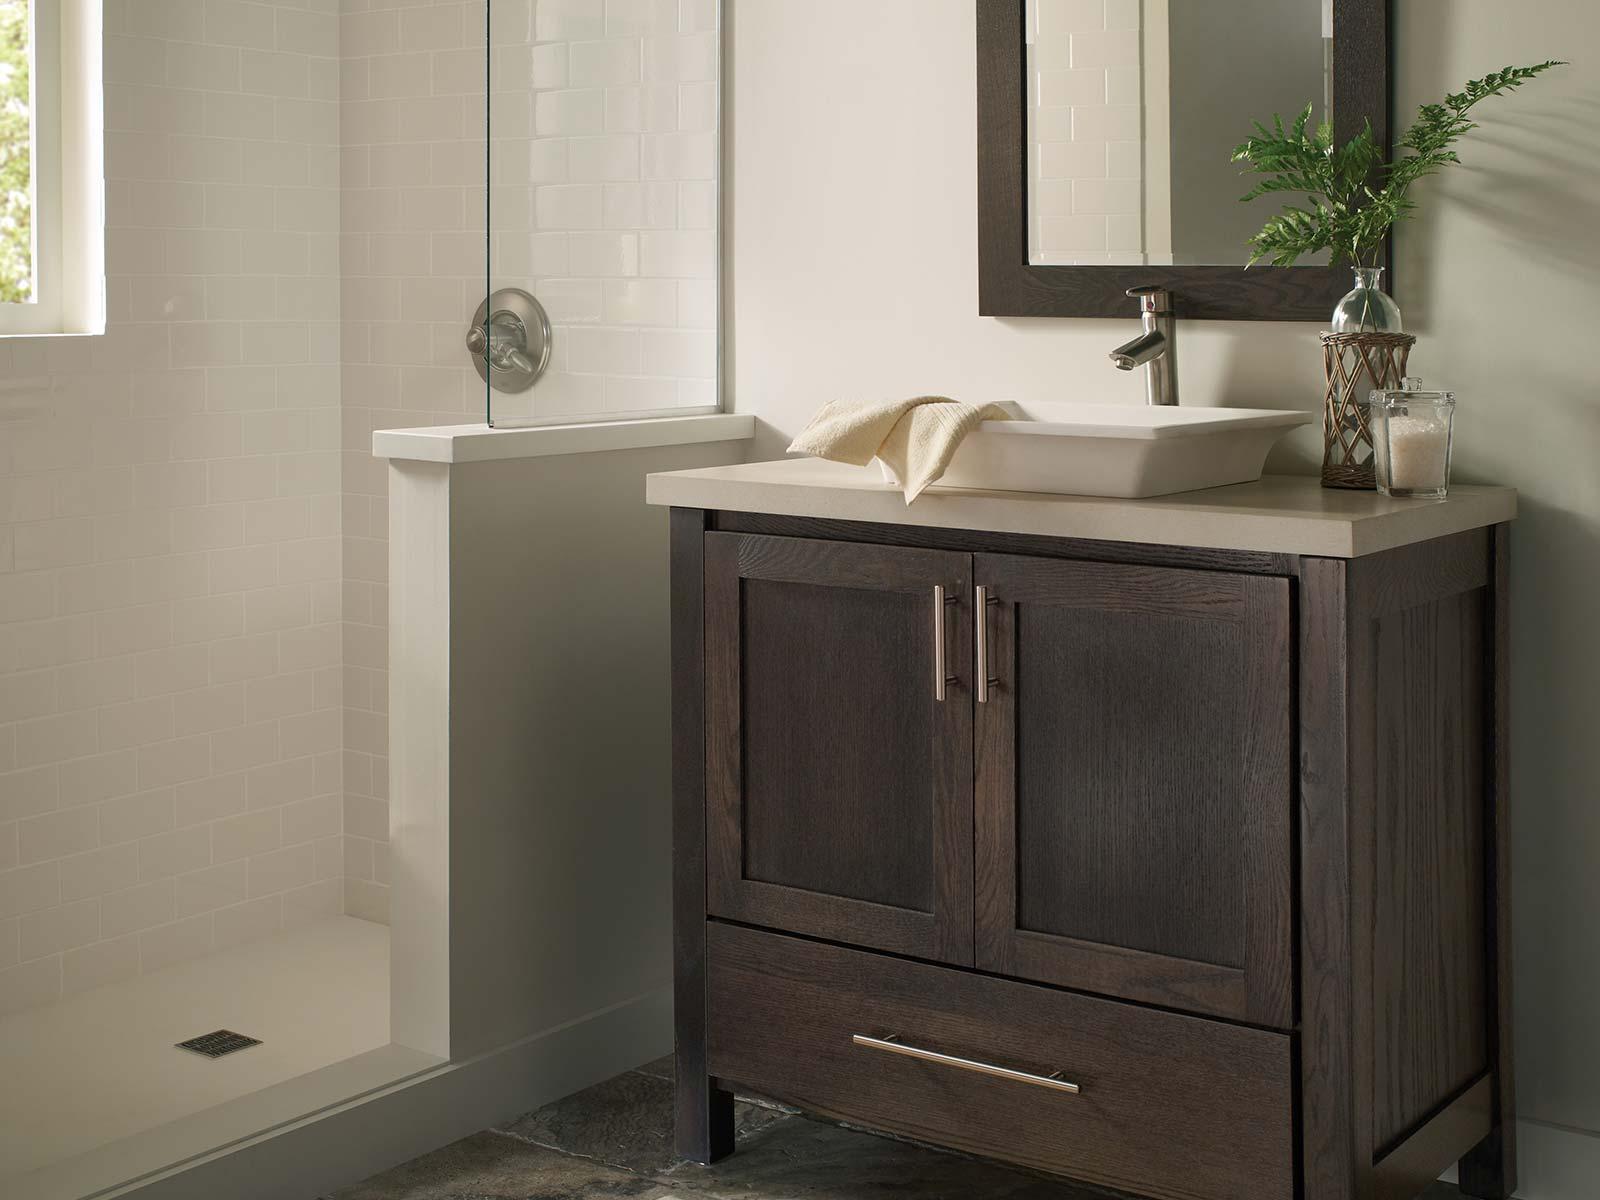 Interlude Bath Vanity Bertch Vanity Manufacturing